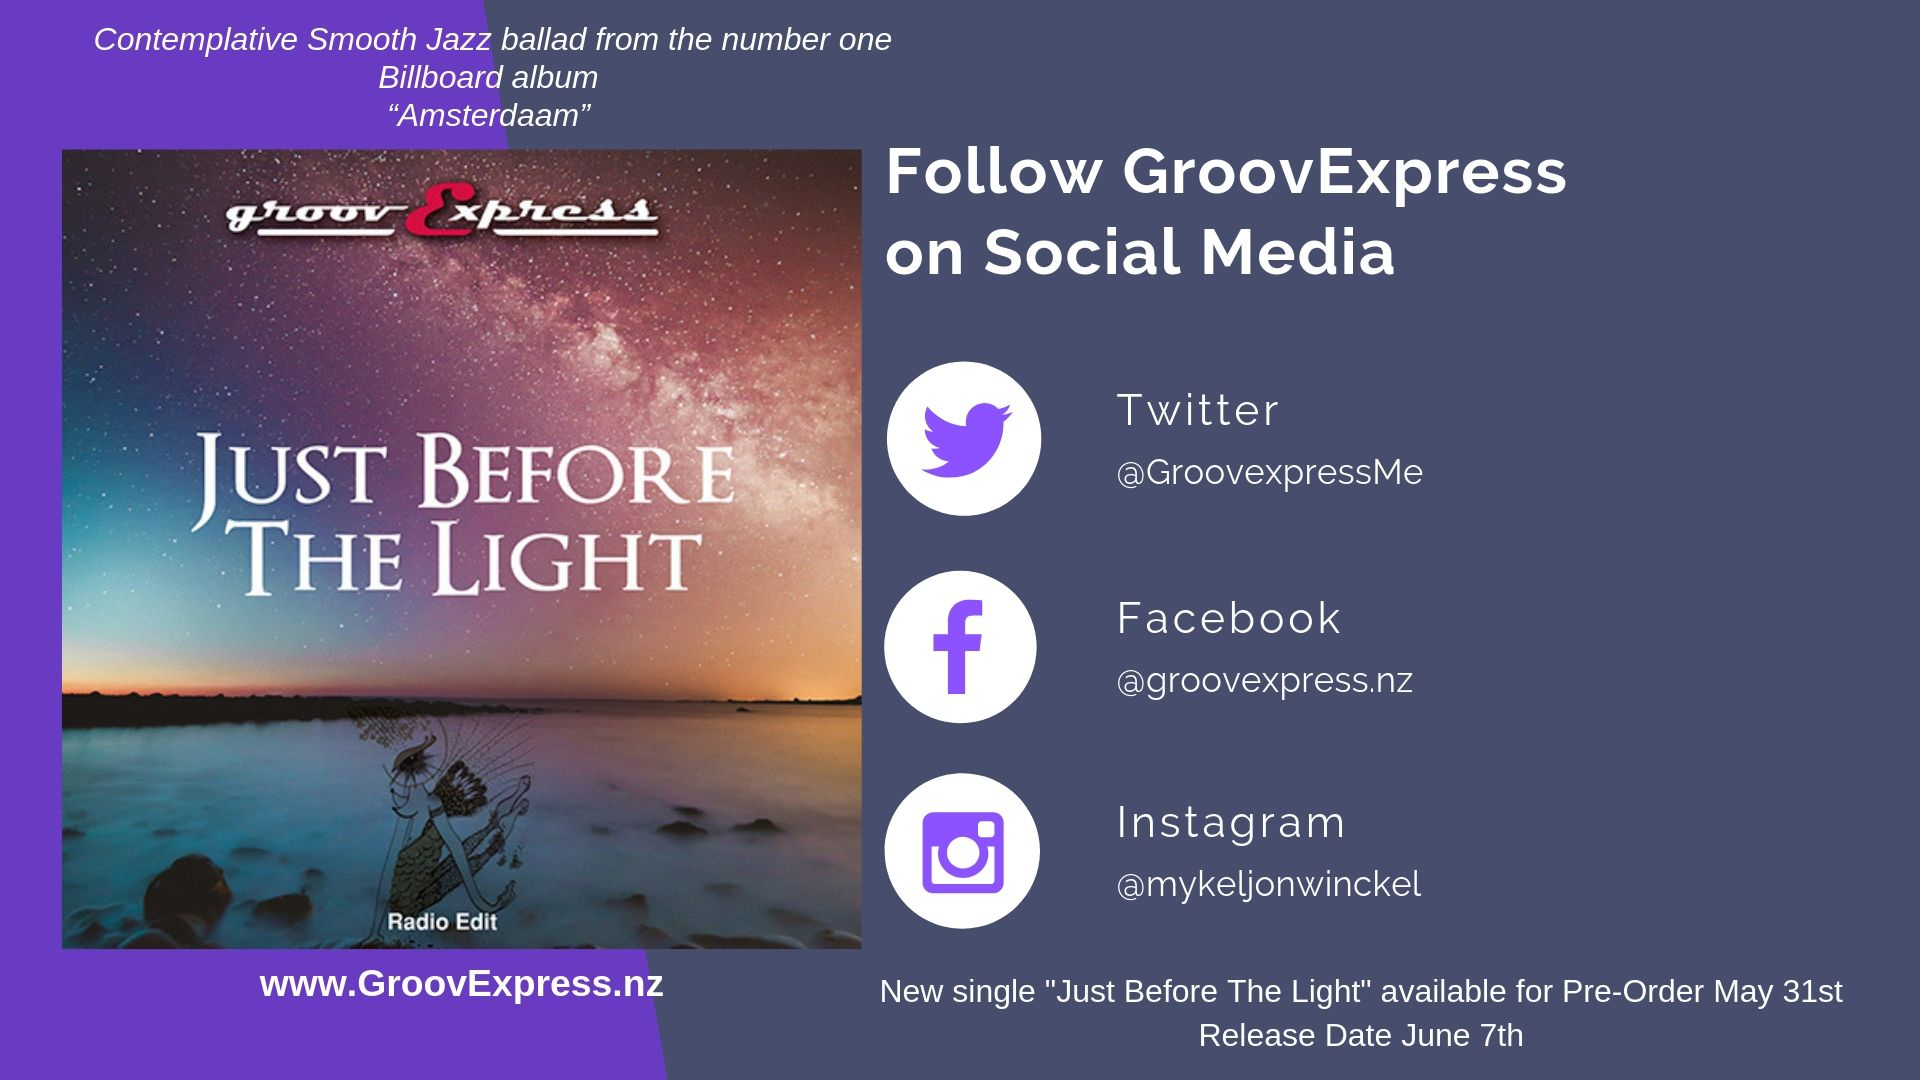 Follow groovexpress on Social Media